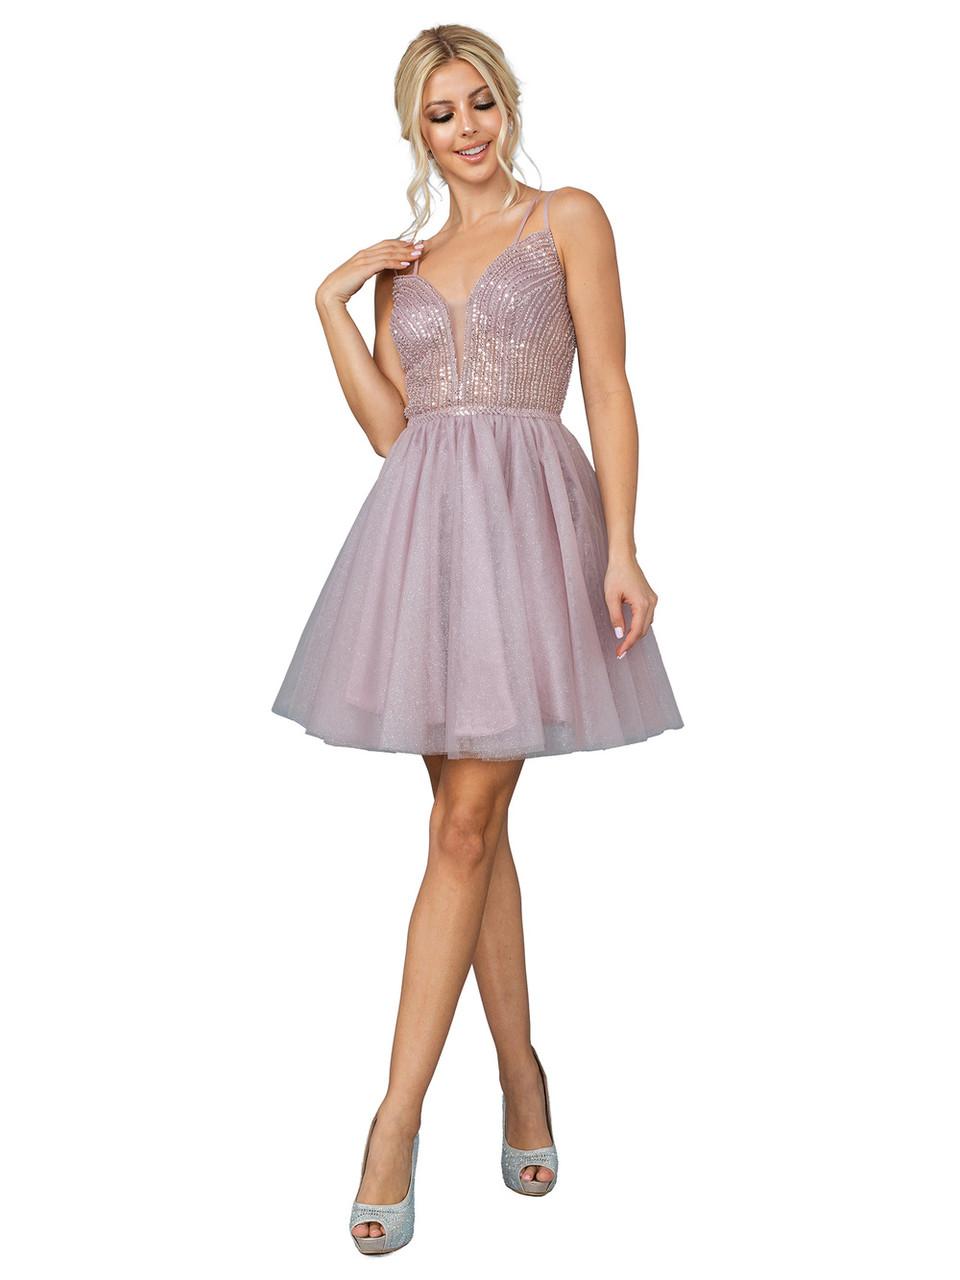 Dancing Queen 3268 Sleeveless Beaded V-neck Short Dress